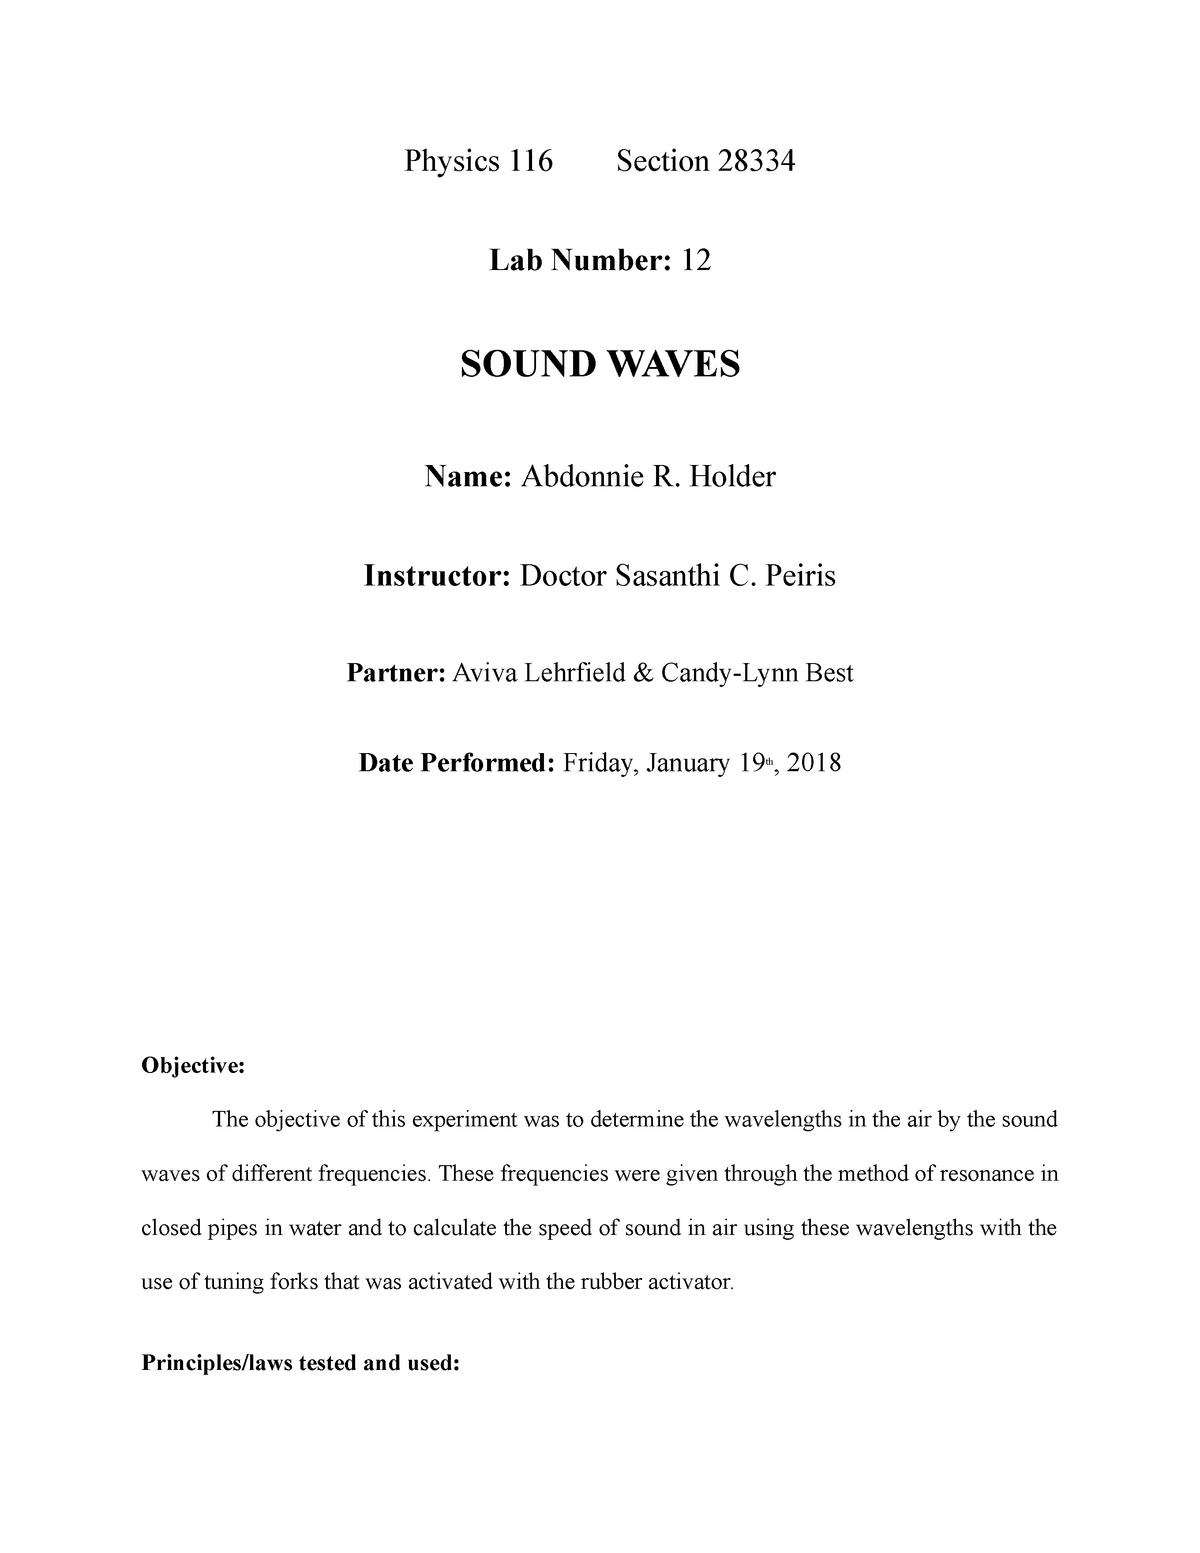 116 sound waves - lab report - PHY 116 Physics I - CSI - StuDocu